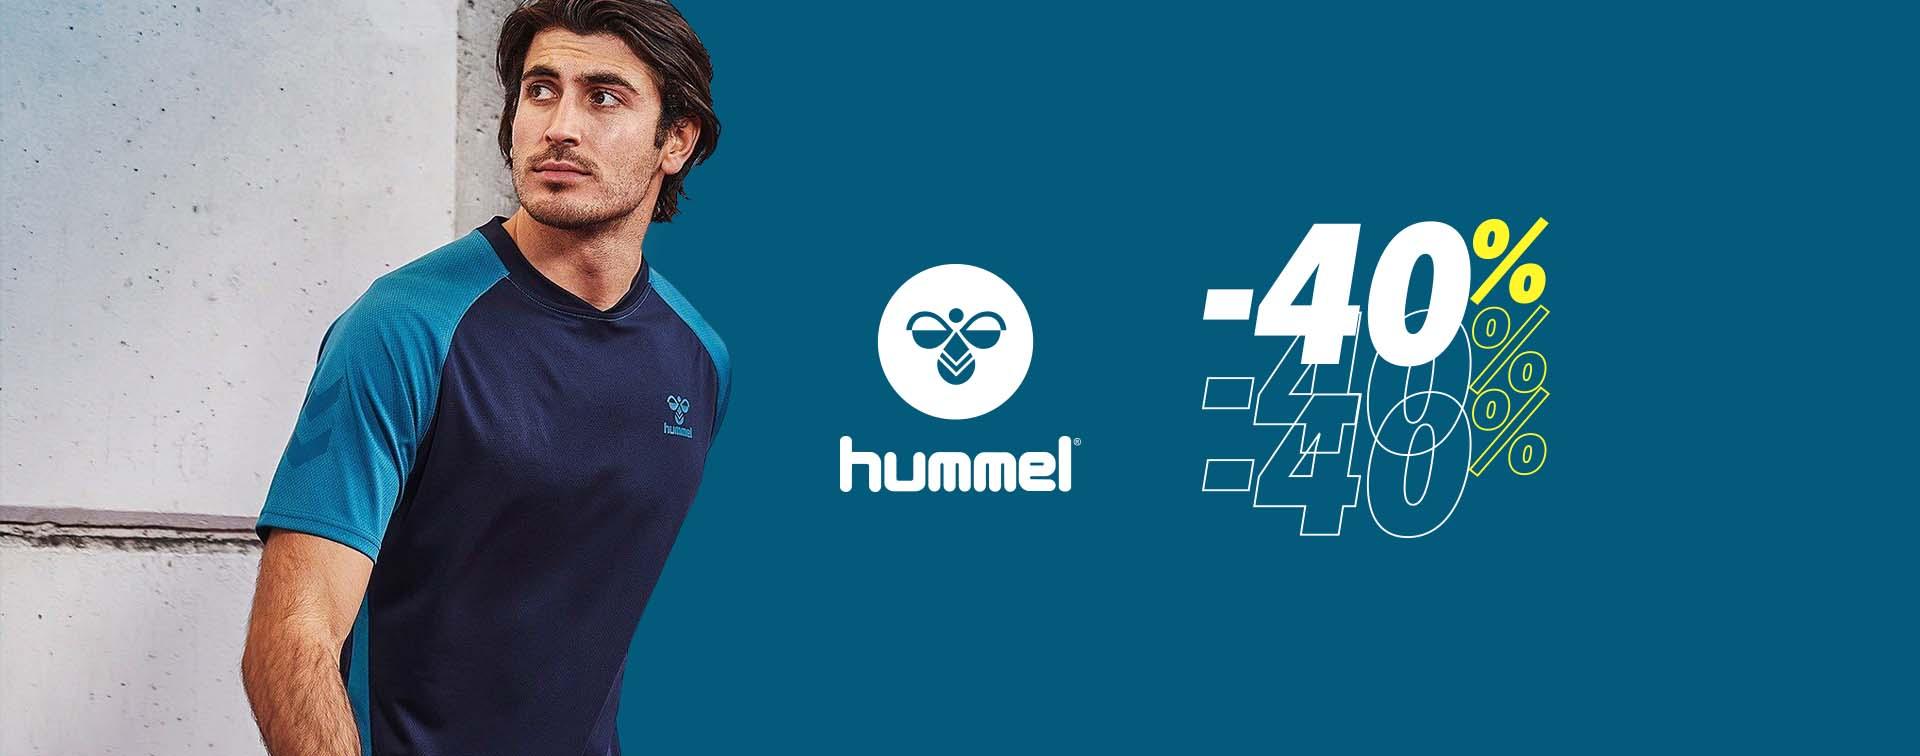 Hummel : top marque handball